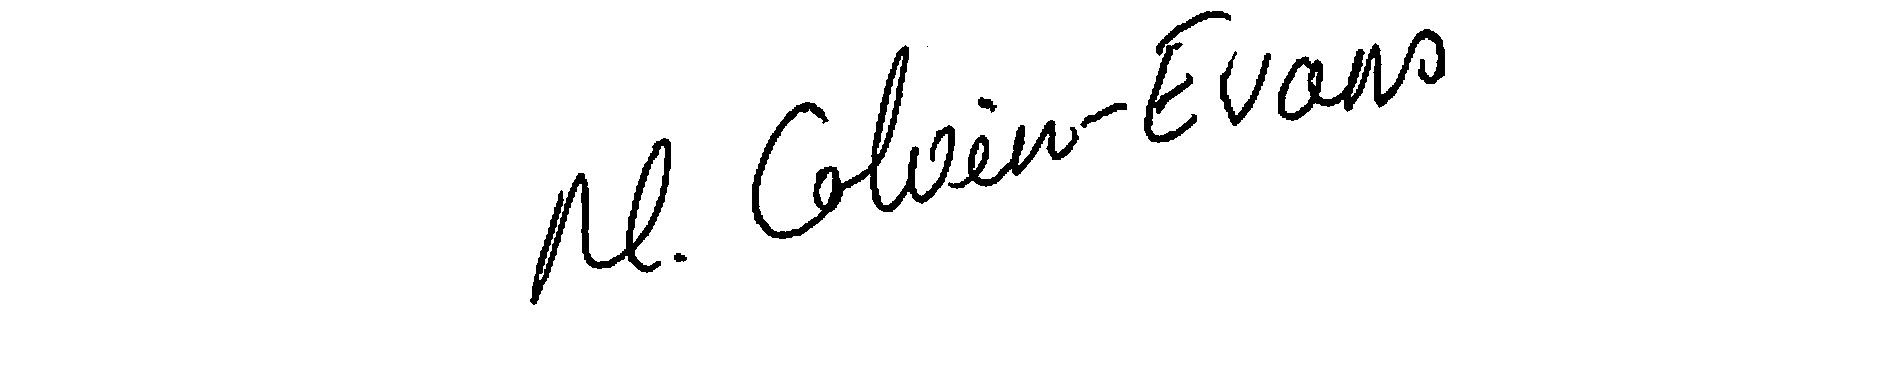 Moya Colvin-Evans's Signature